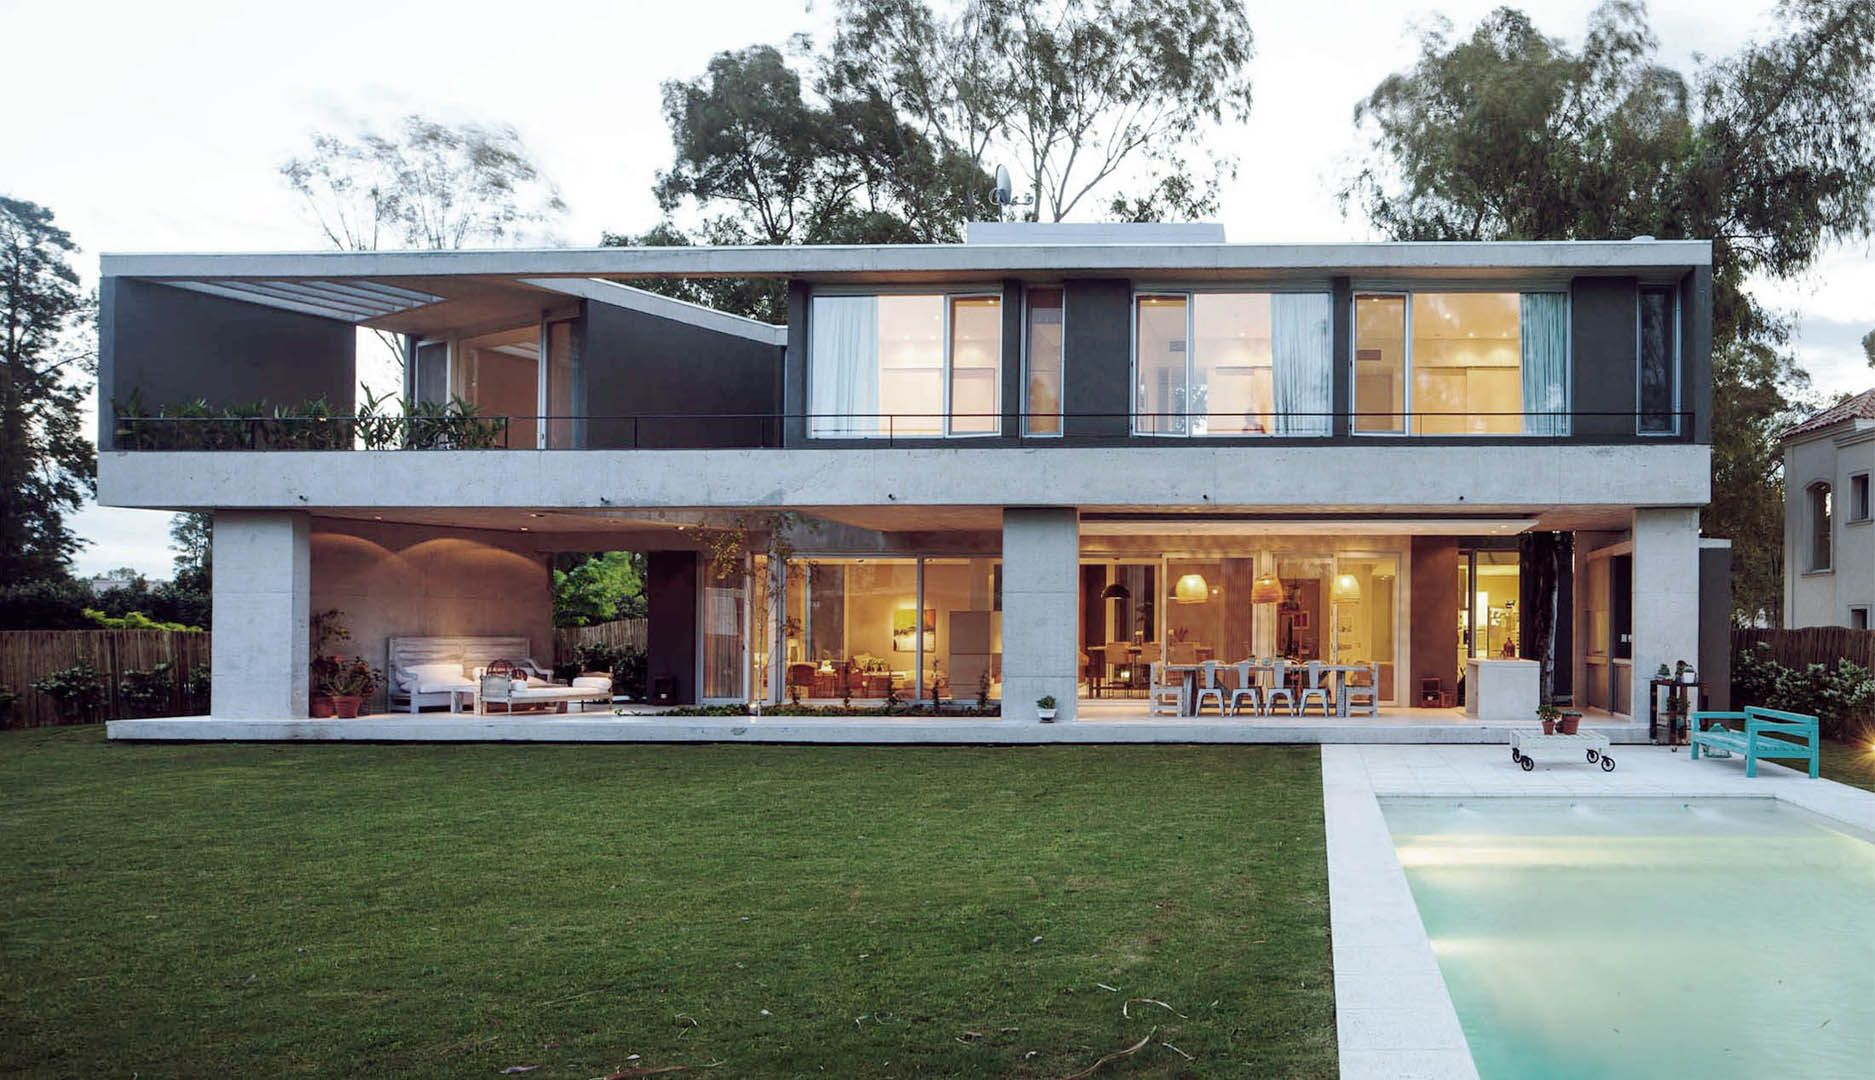 Amado cattaneo arquitectos casa e224 arquitectura for Portal de arquitectos casa de campo